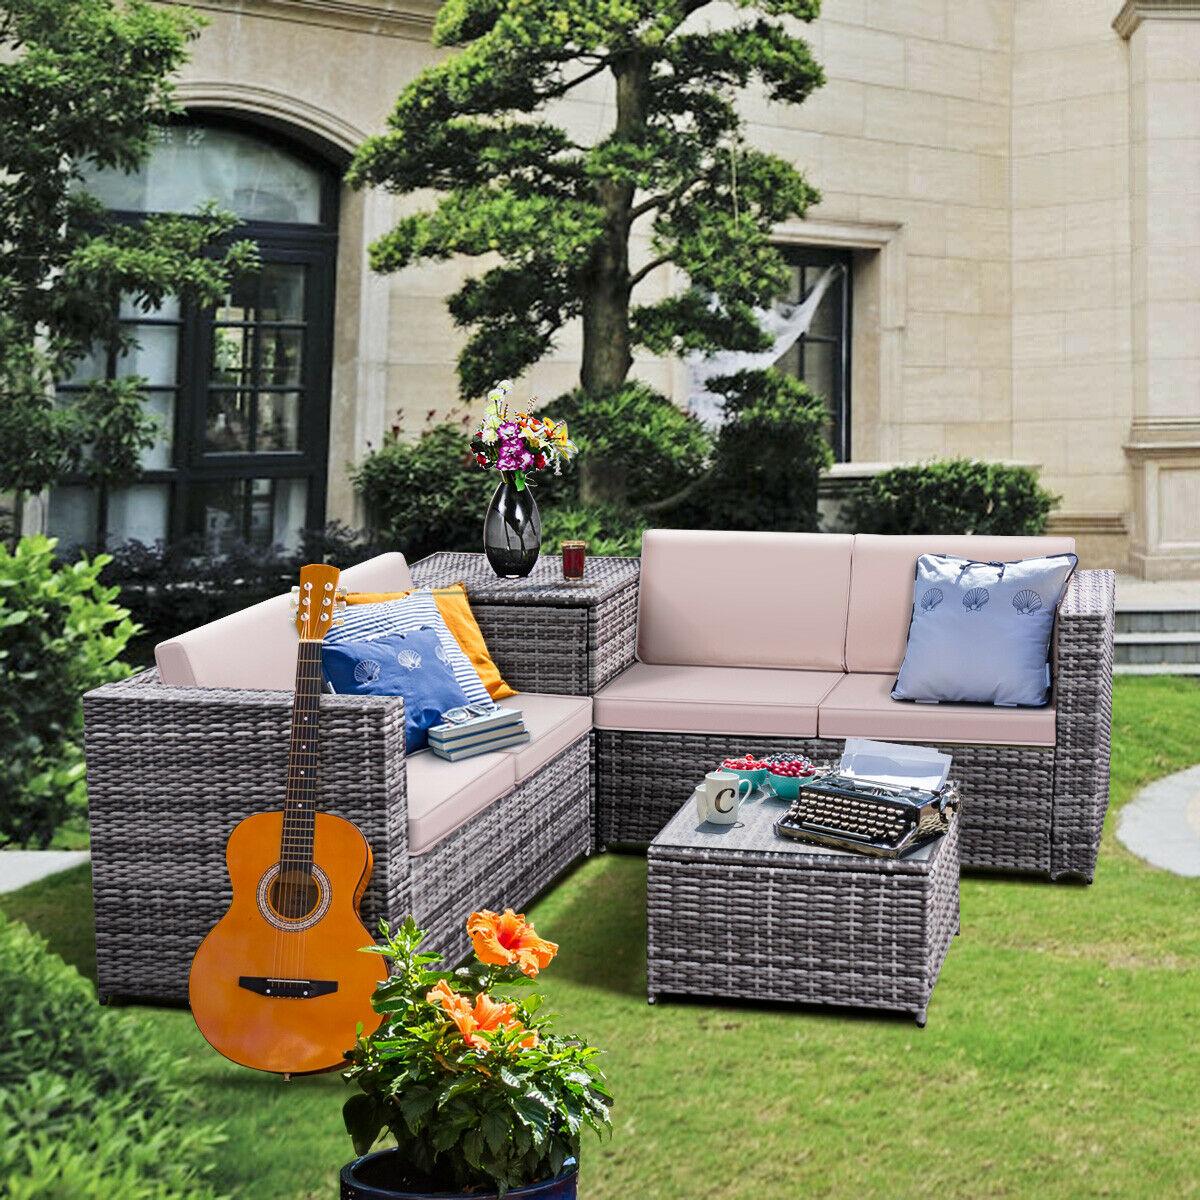 Costway 4PCS Patio Rattan Wicker Furniture Set Sofa Loveseat Cushioned W/Storage Box